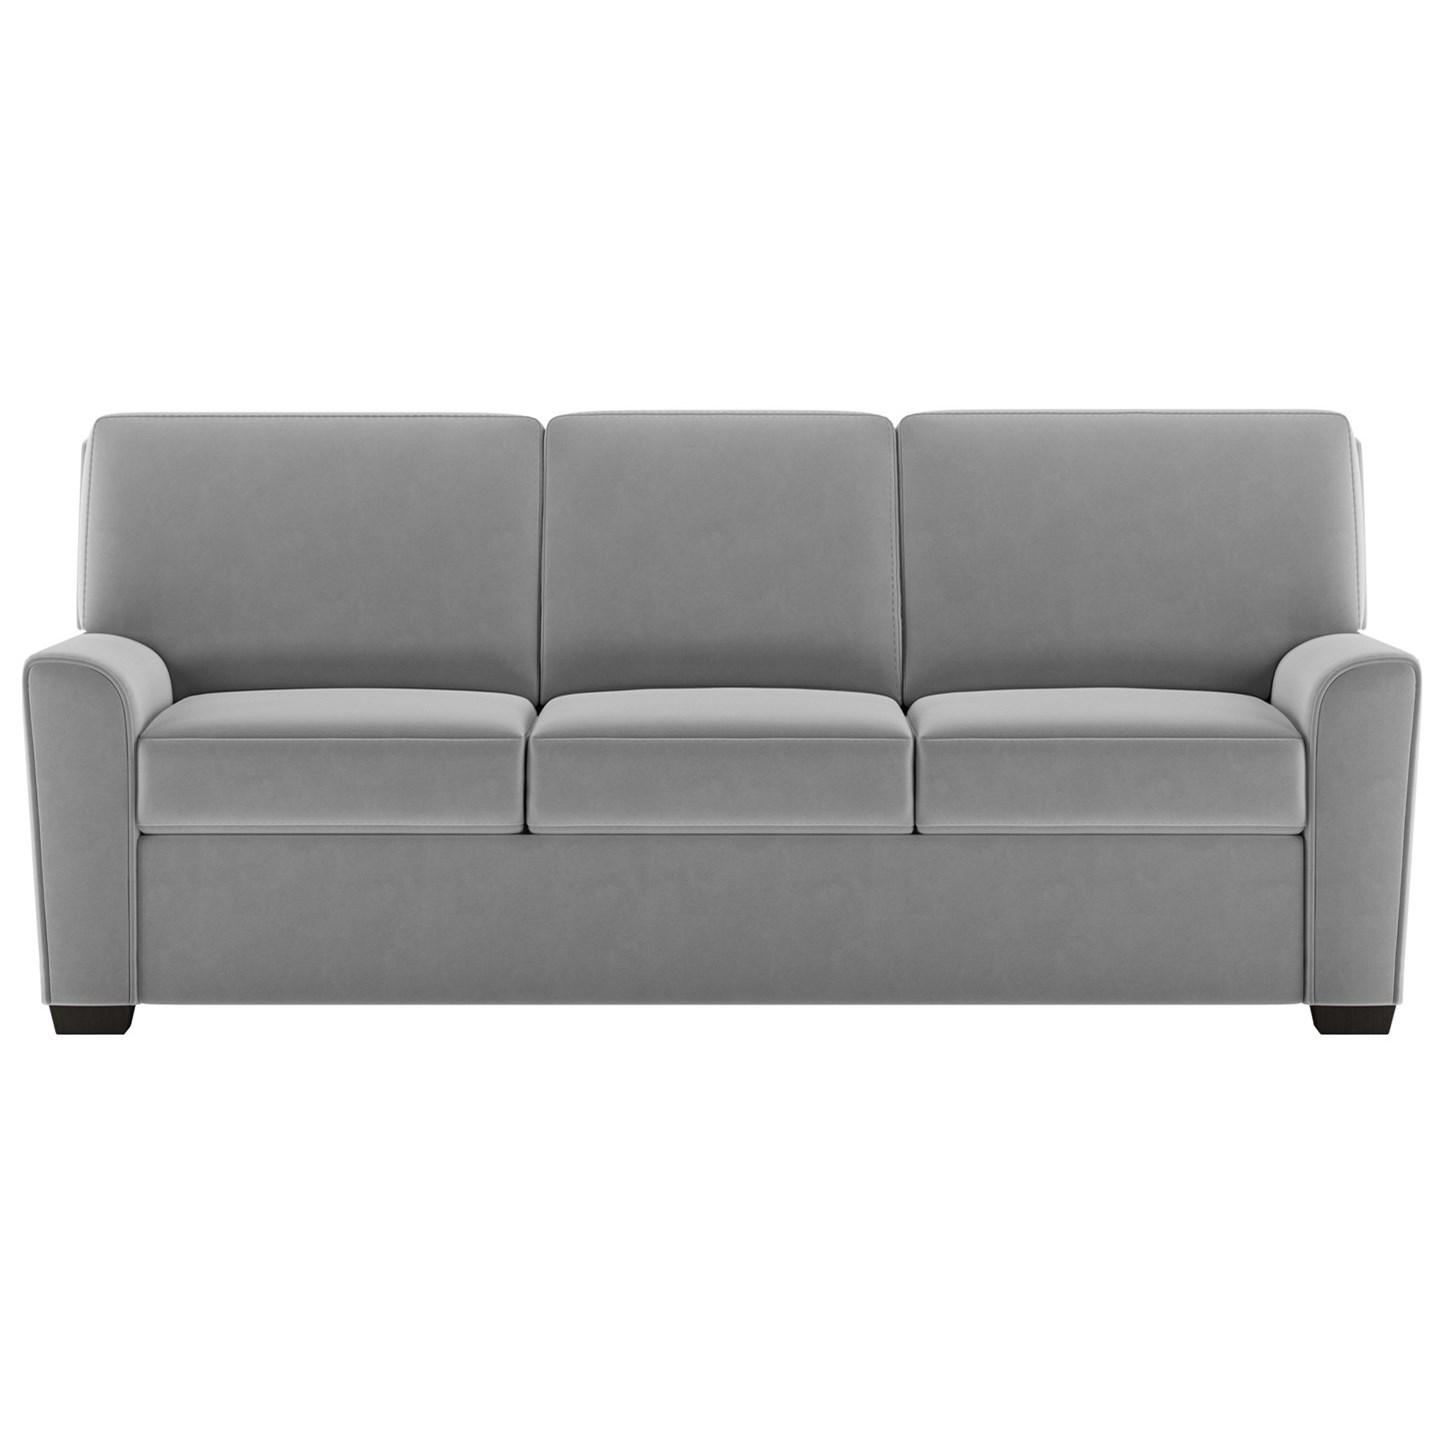 American Leather Klein King Size Comfort Sleeper Sofa